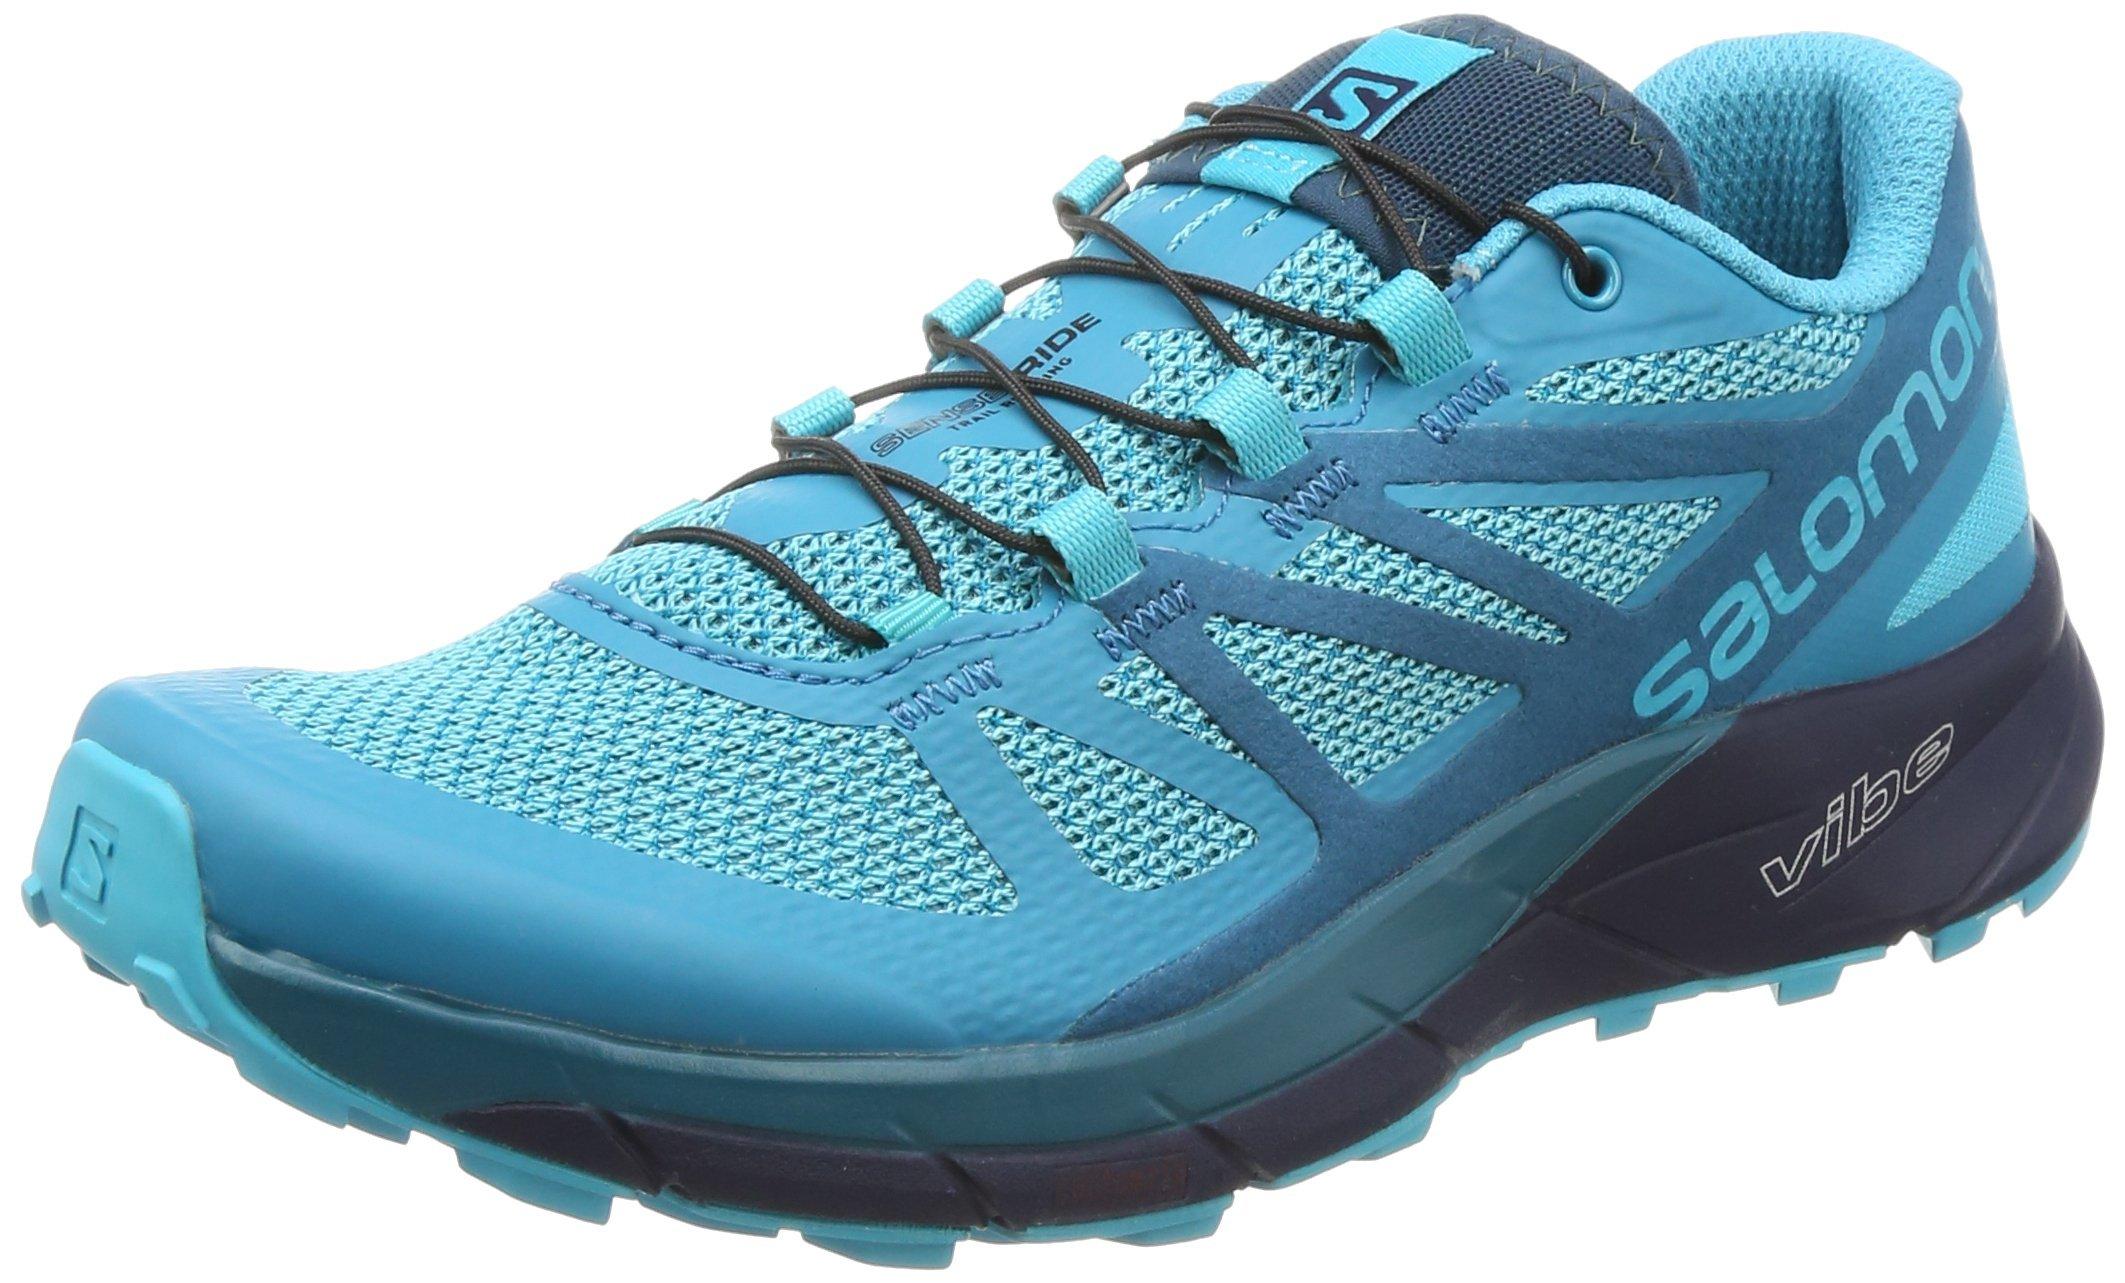 Salomon Women's Sense Ride Trail Running Shoes Blue Bird/Deep Lagoon/Navy Blazer 6